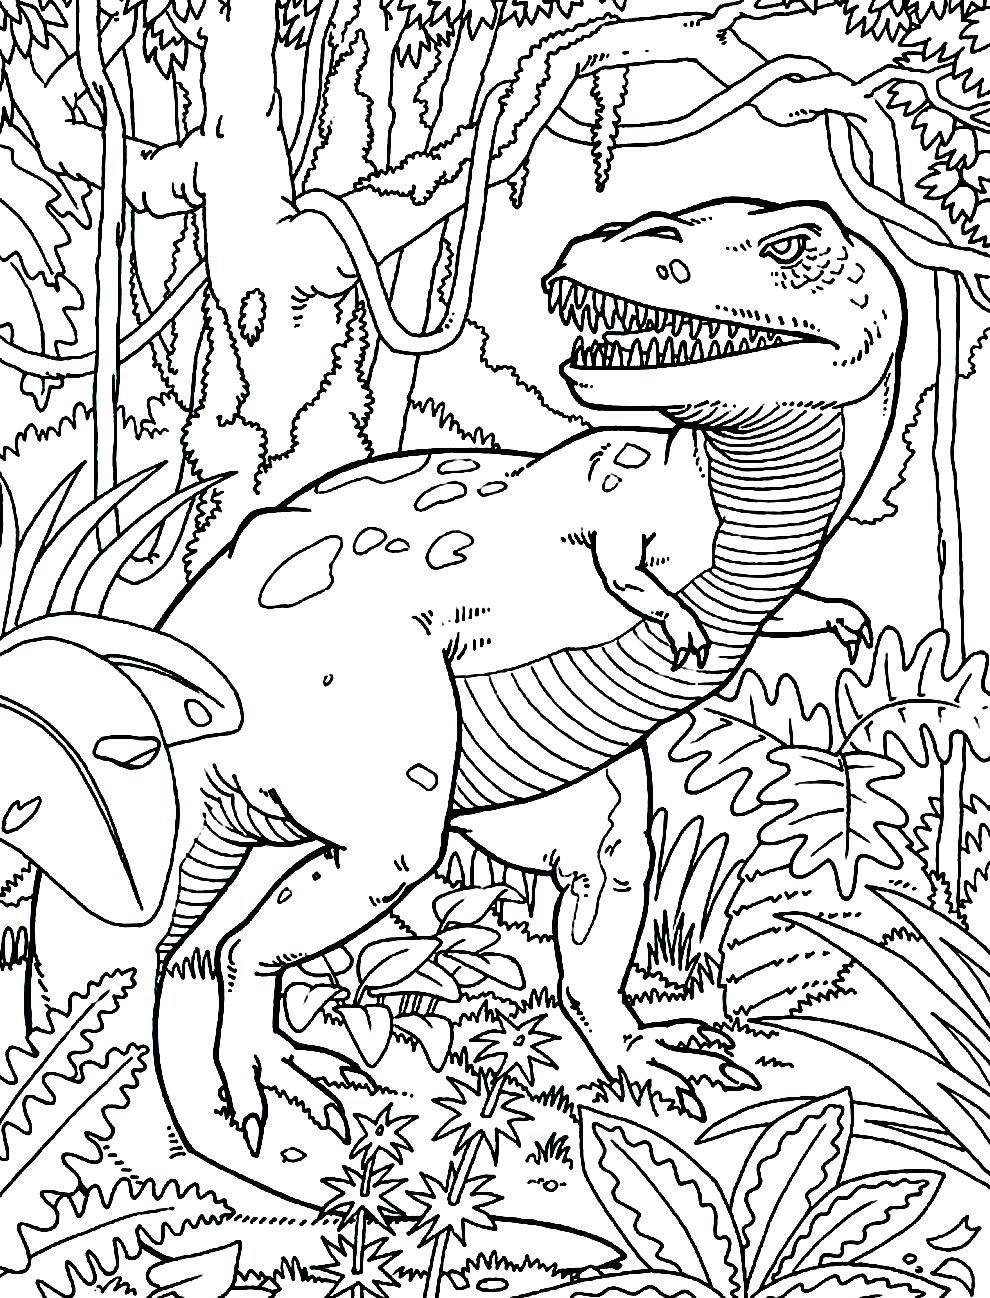 Desenho de T-Rex para colorir e imprimir